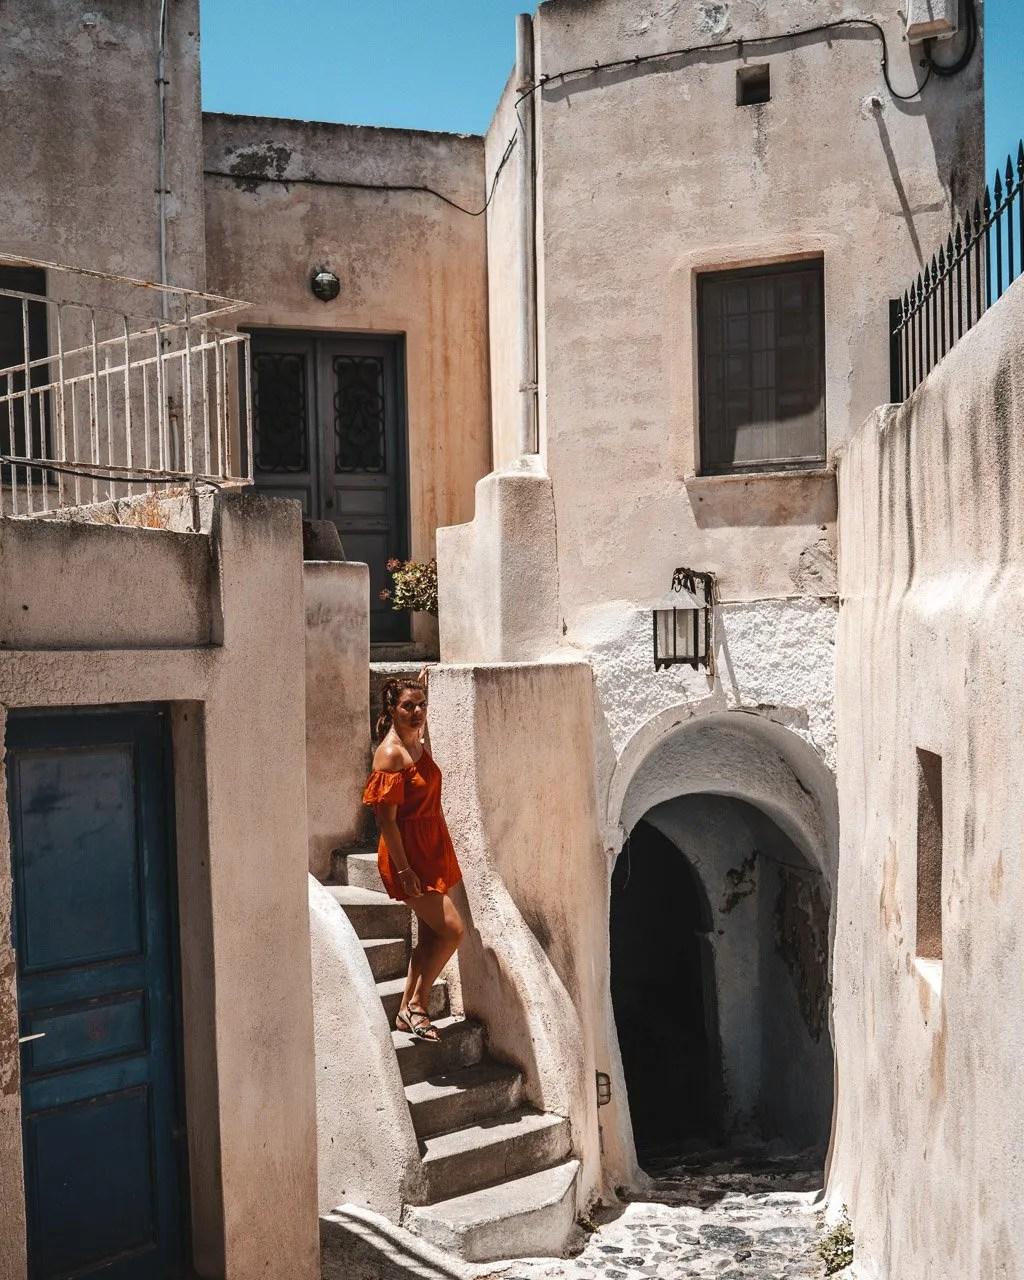 Pyrgos in Santorini, Pyrgos, Visit Santorini, Must see in Santorini, Places to visit santorini, visit santorini